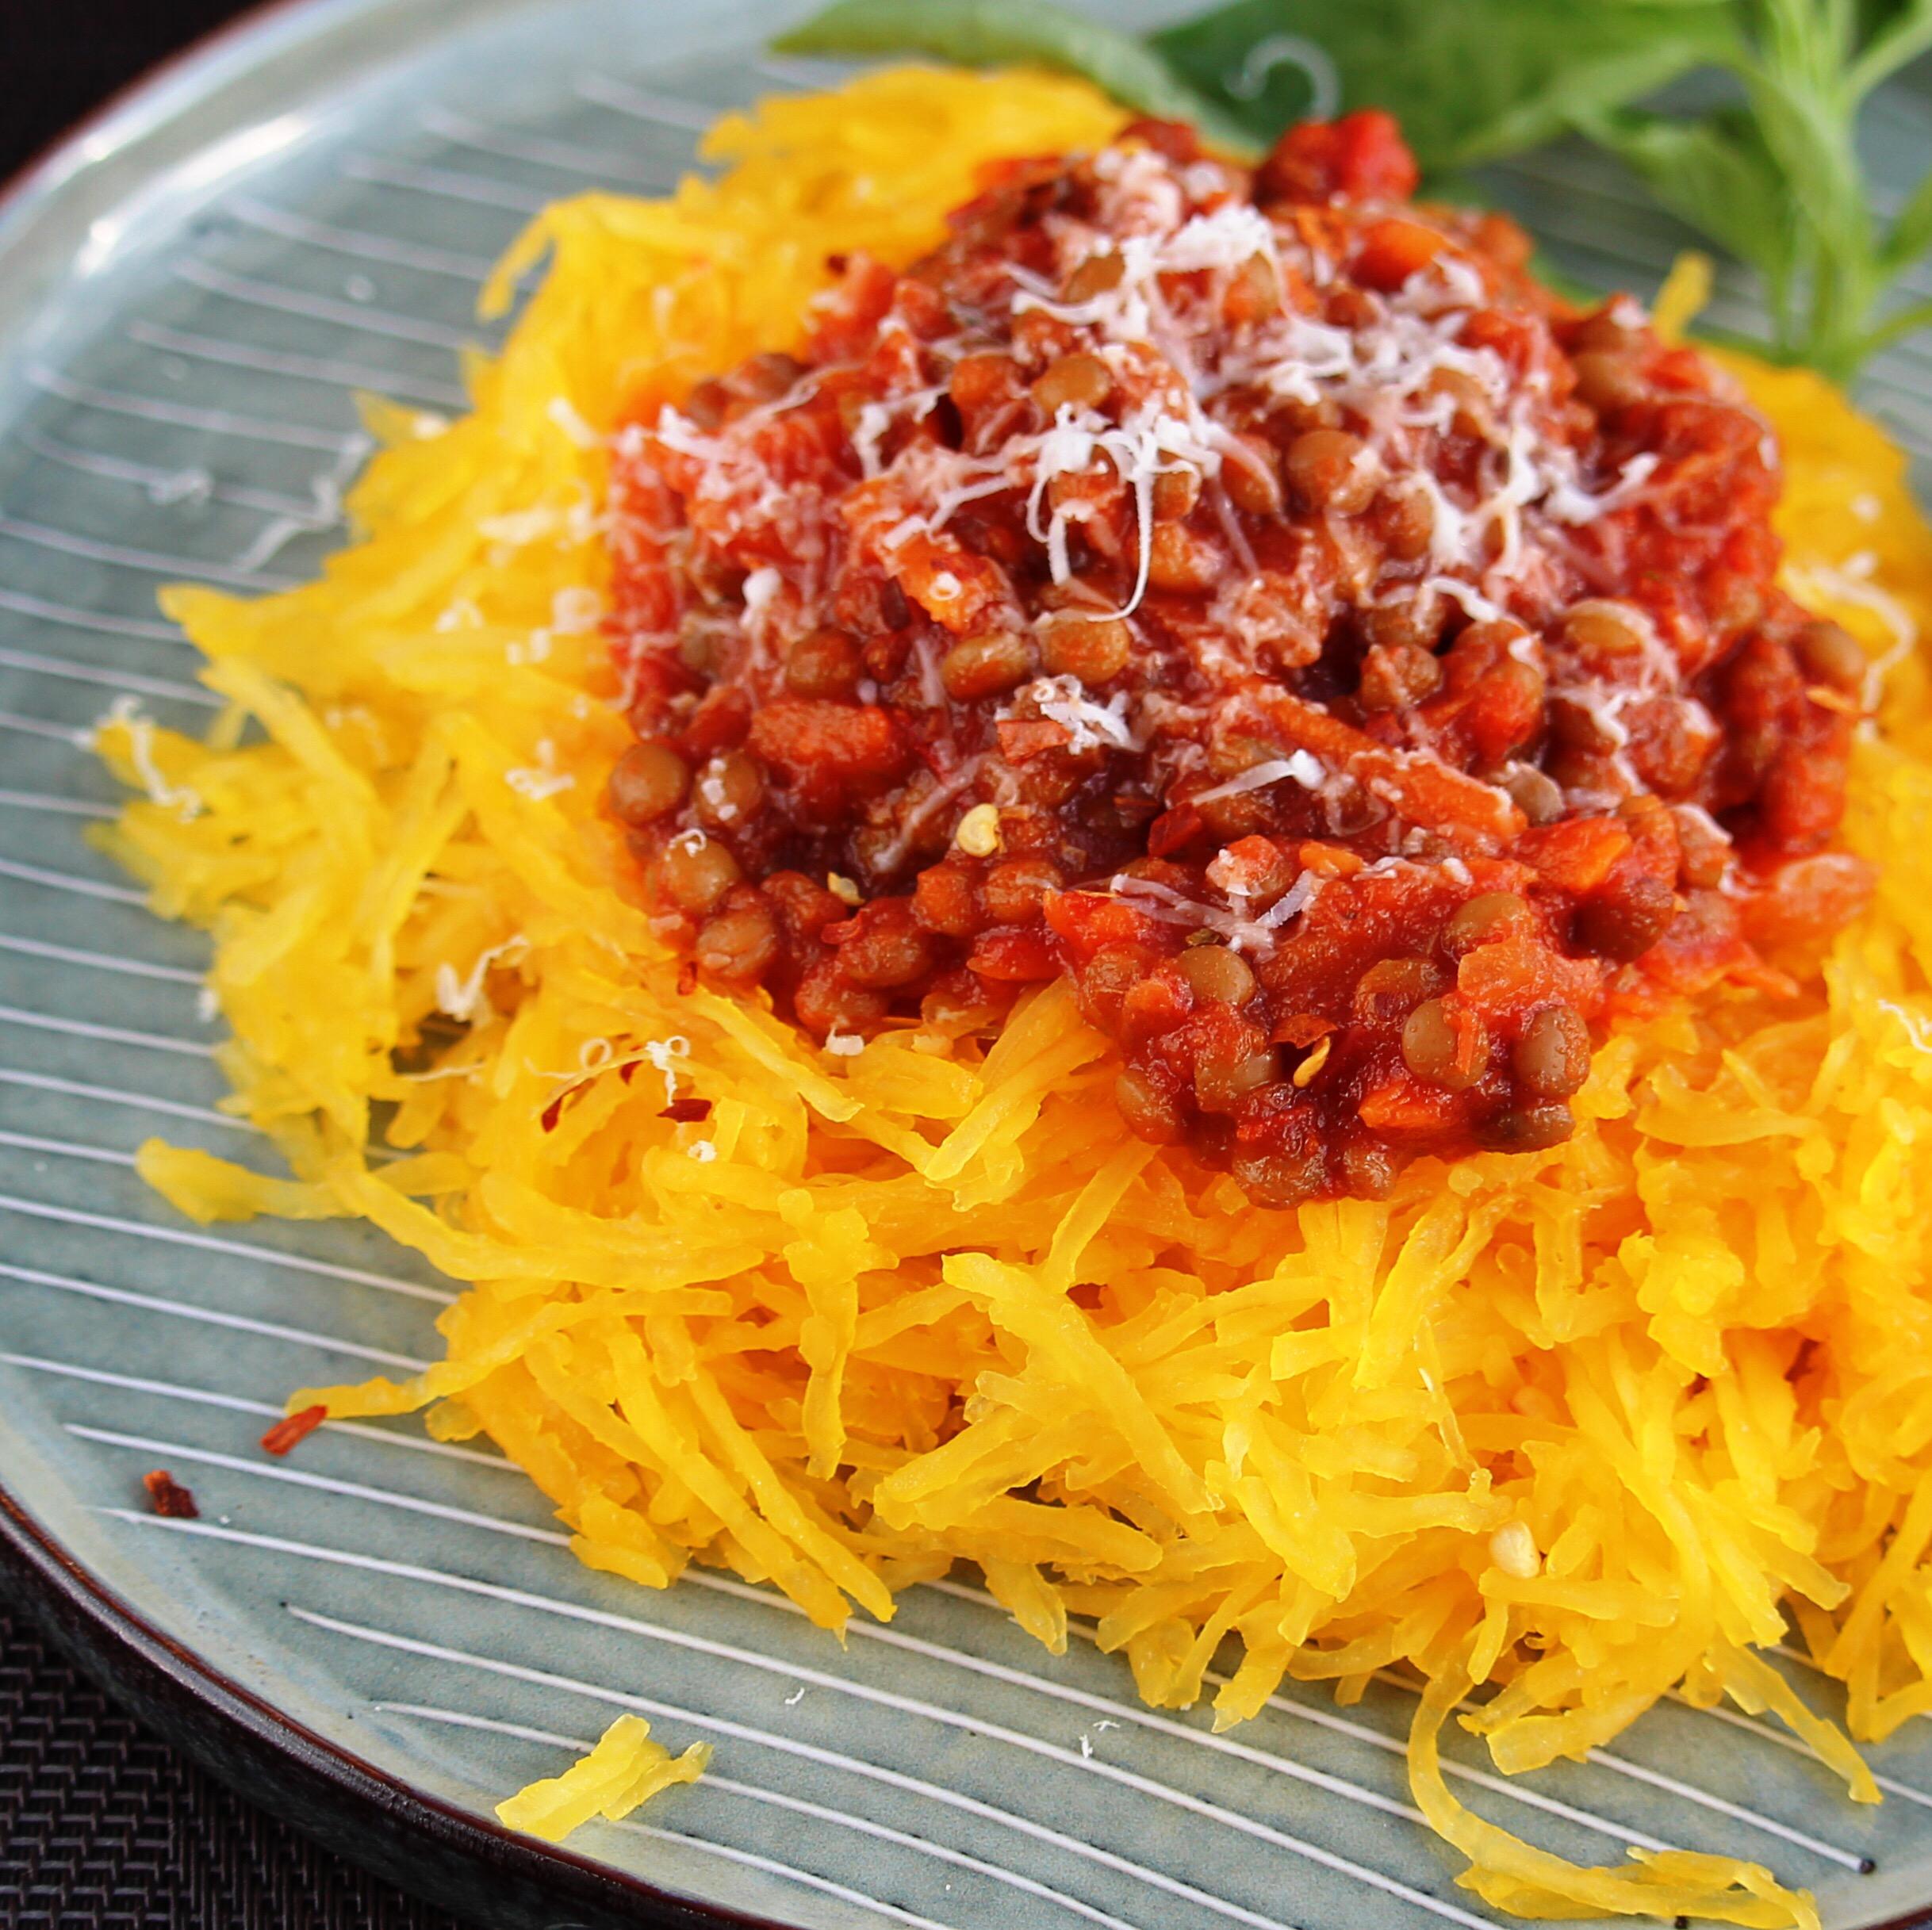 Zucchini Spaghetti with Lentil Marinara